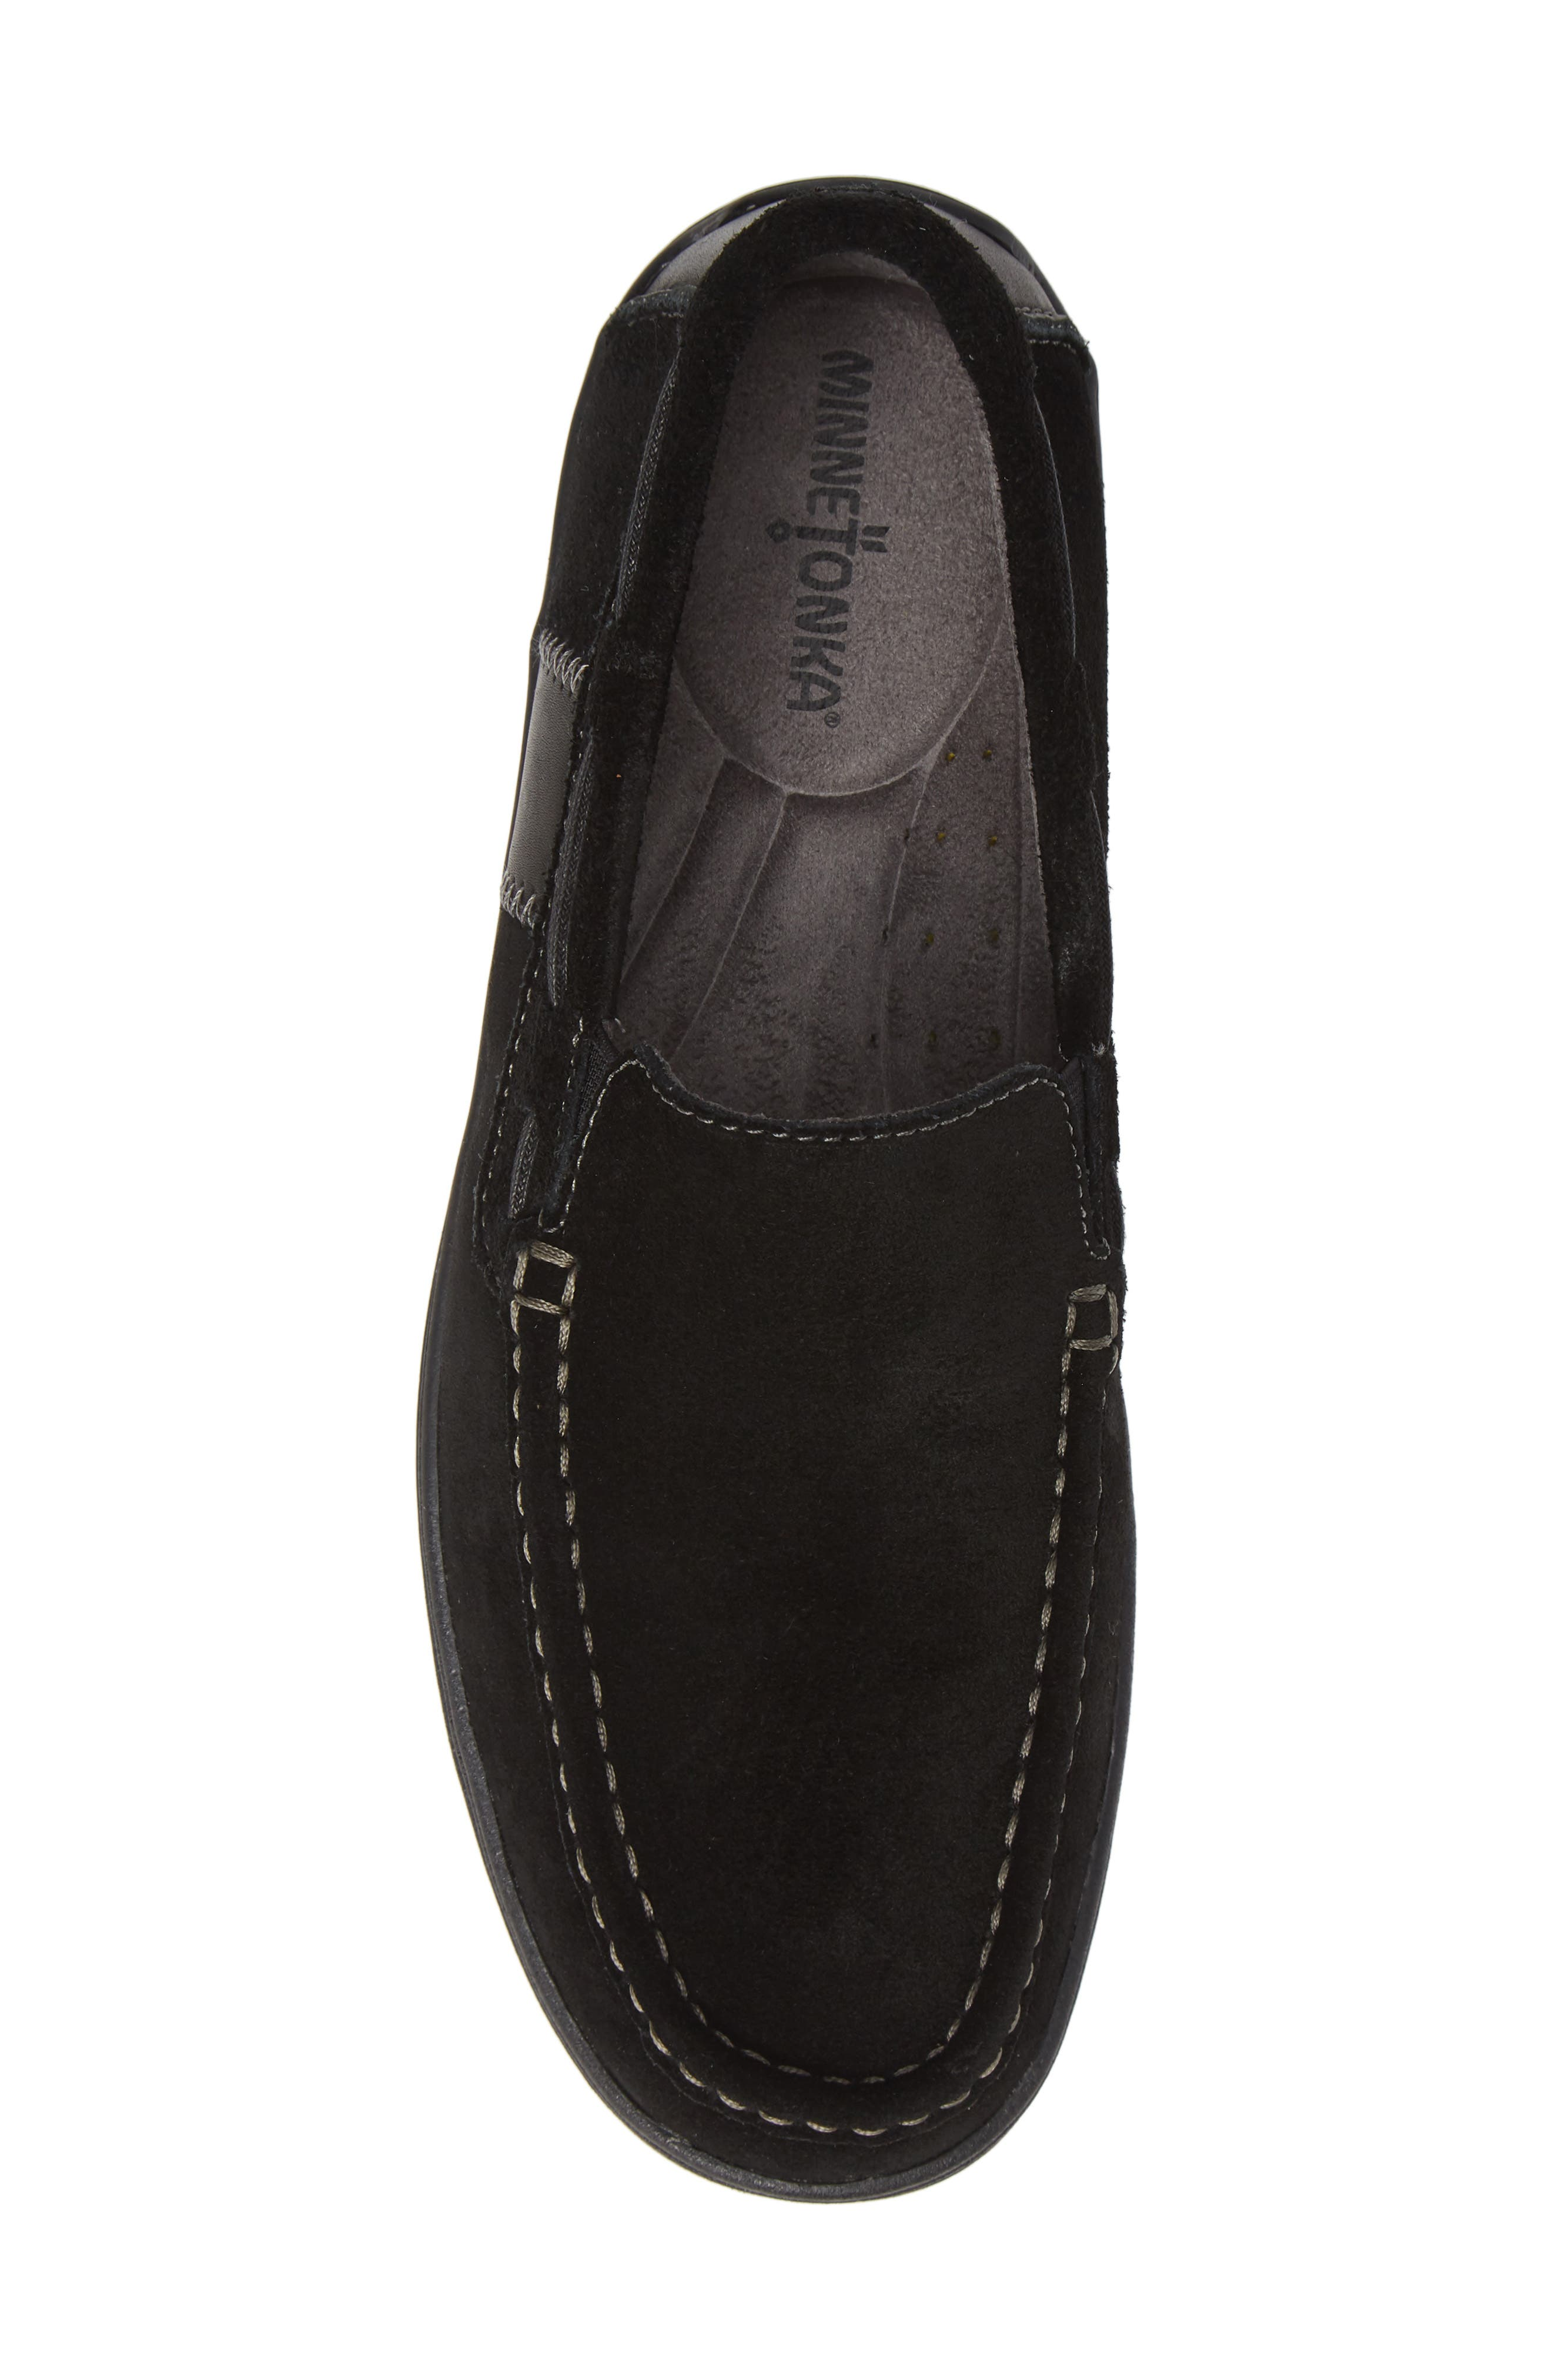 Grant Venetian Loafer,                             Alternate thumbnail 5, color,                             BLACK SUEDE